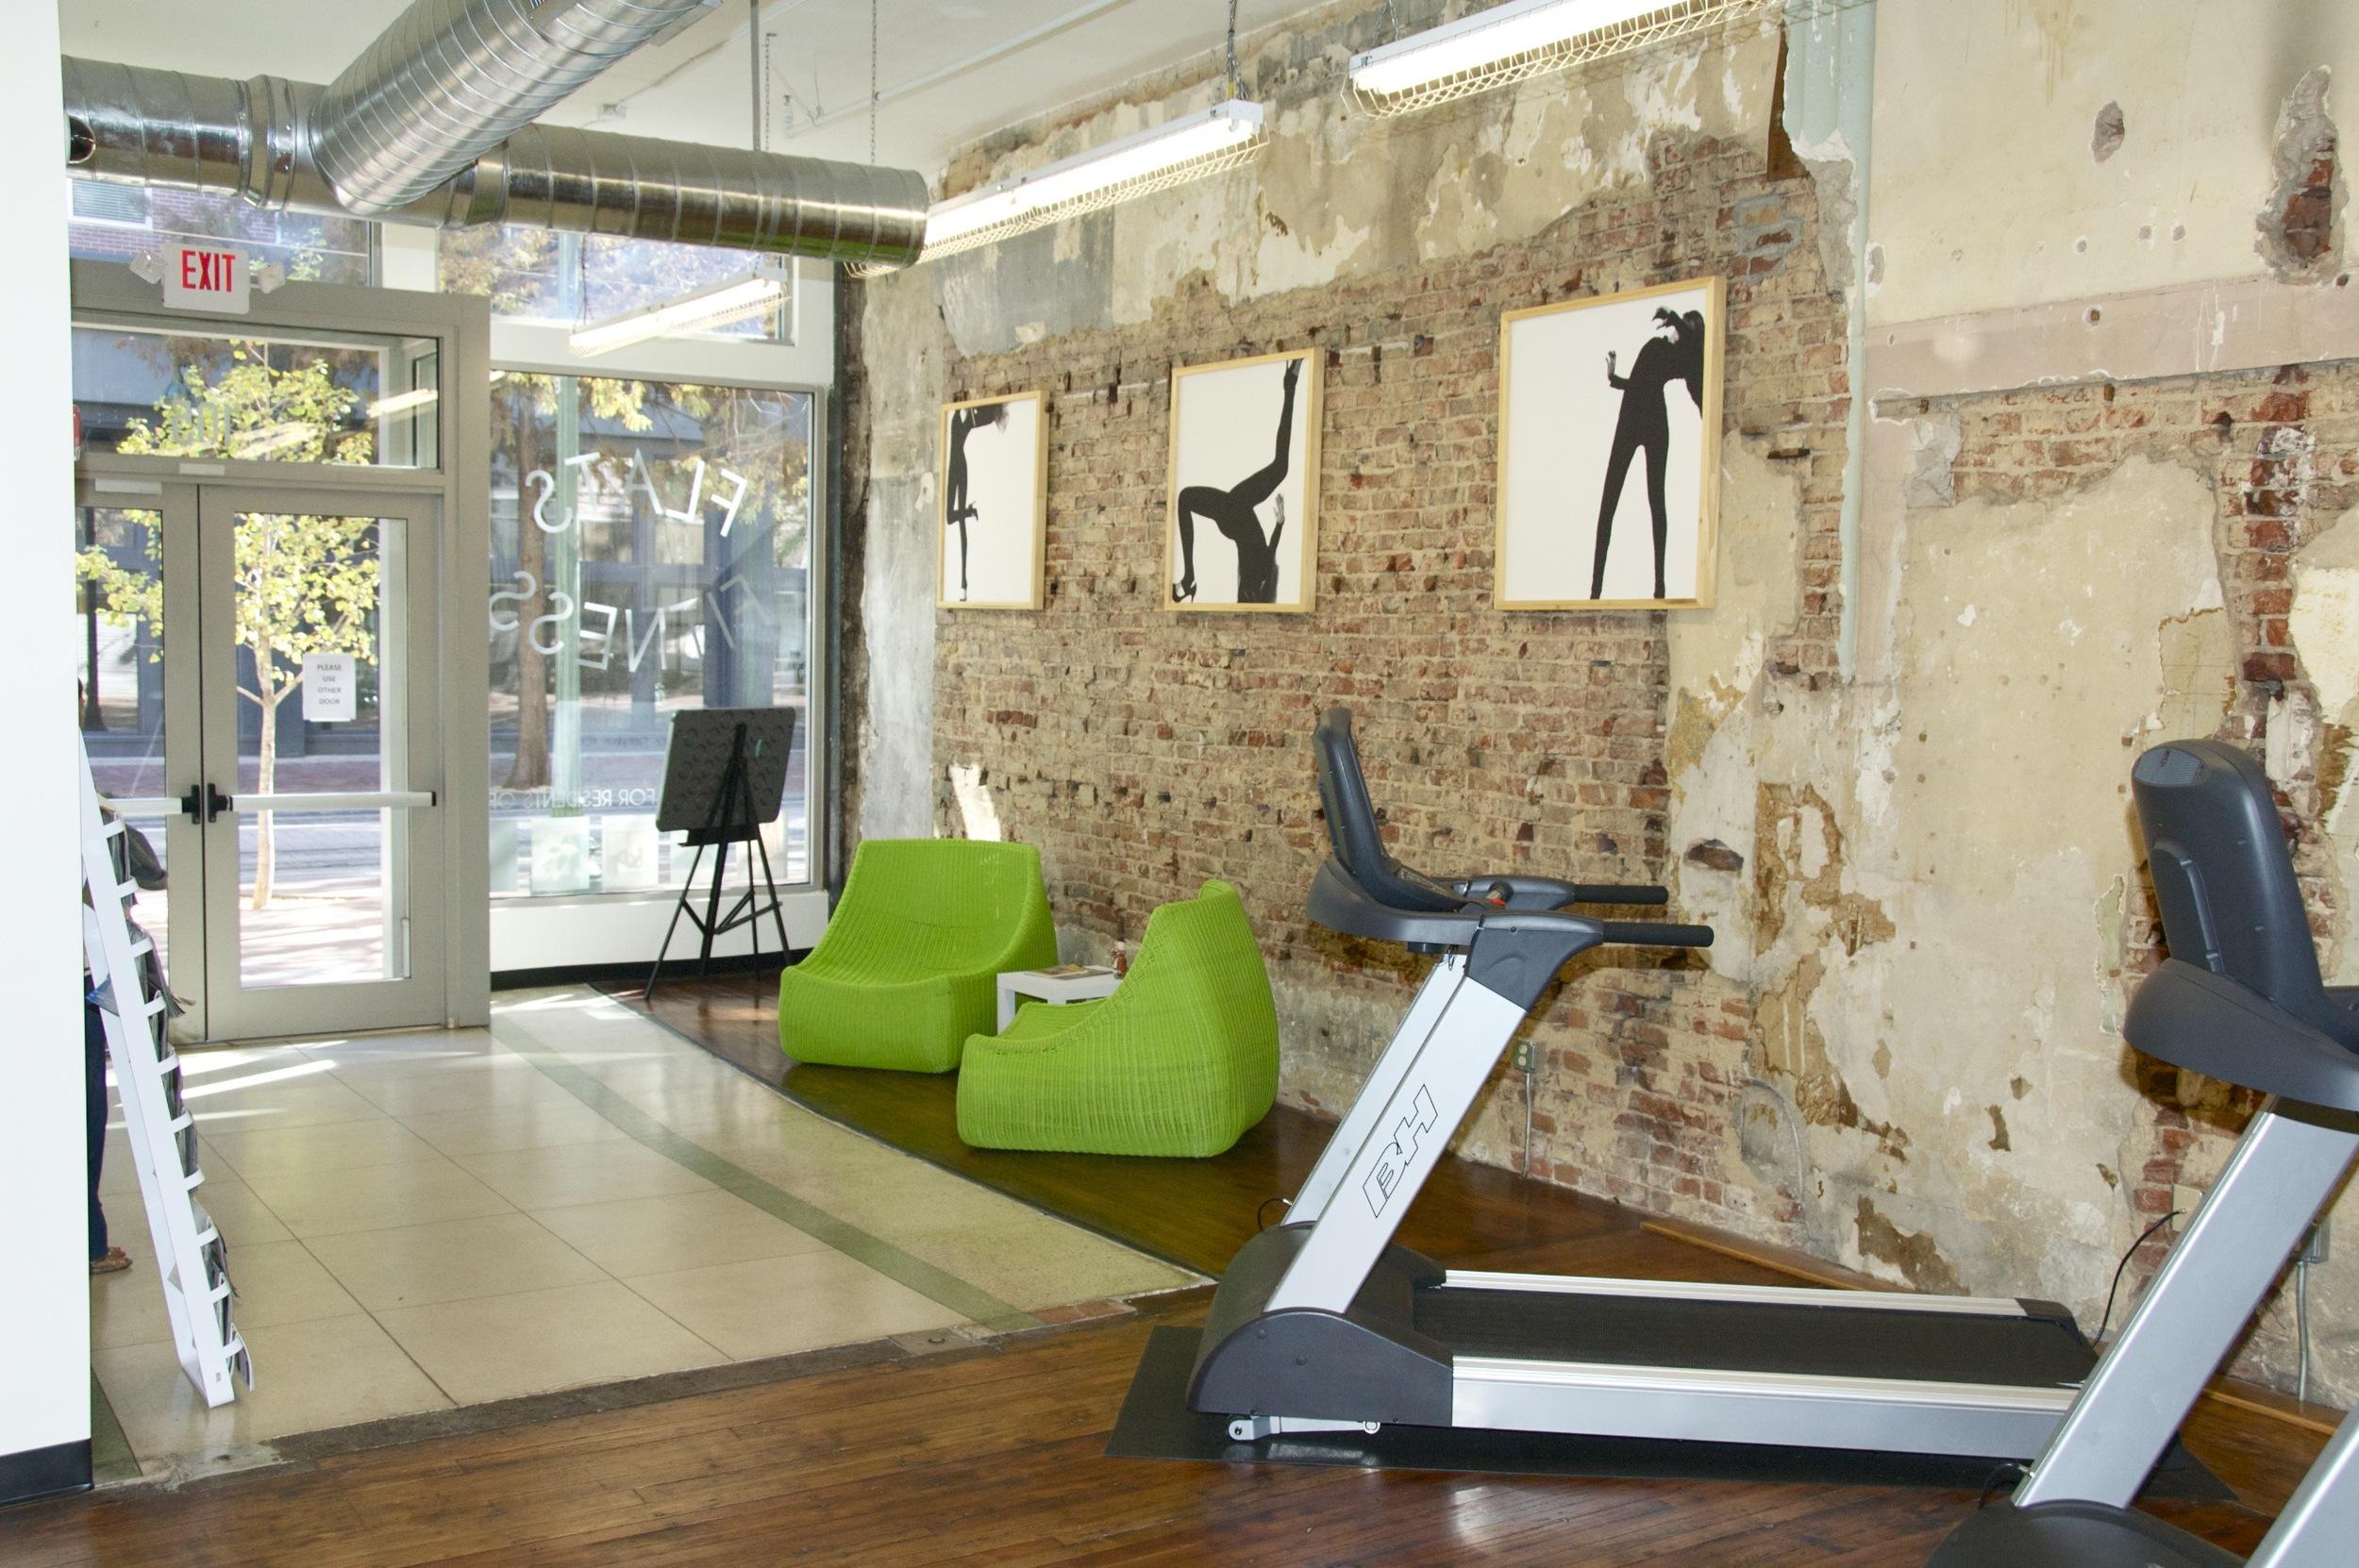 flats fitness 05.jpg